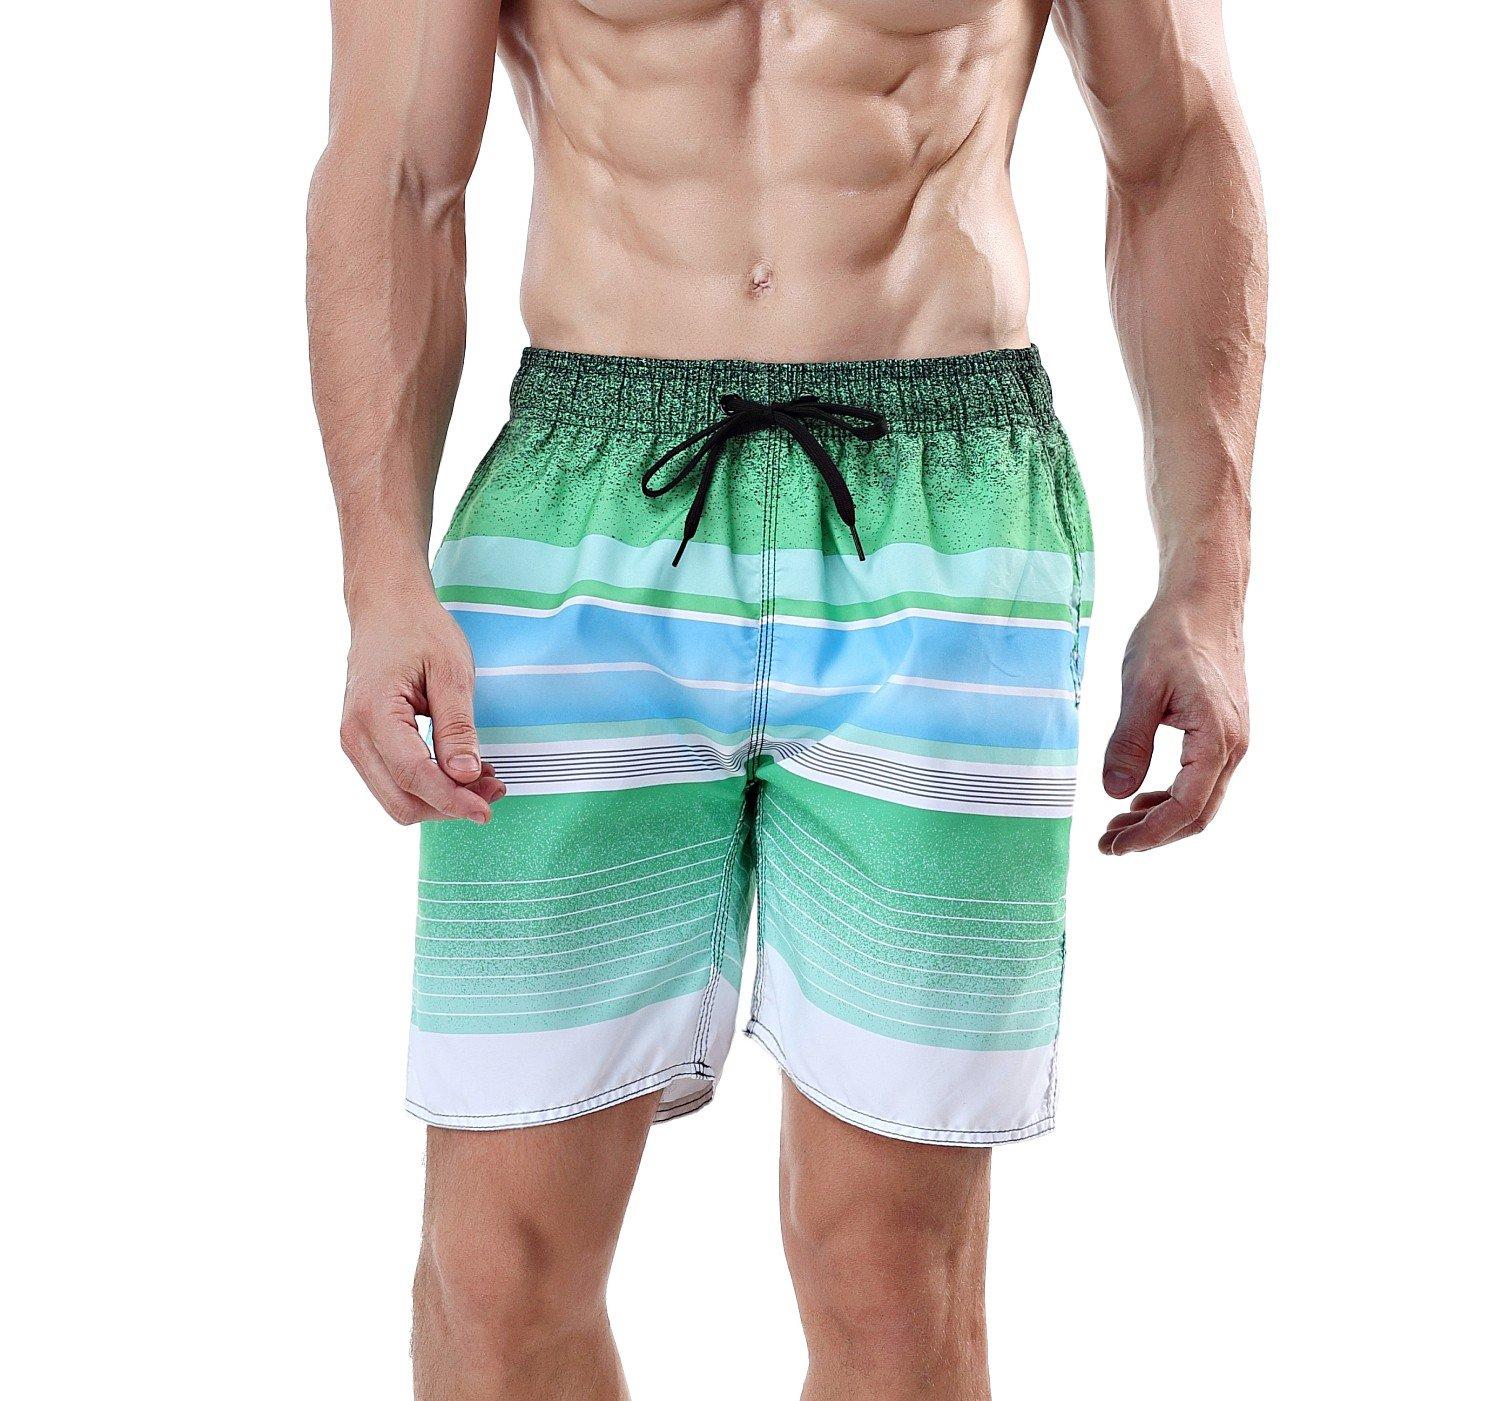 b19f00980c Best Rated in Men's Swim Briefs & Helpful Customer Reviews - Amazon ...